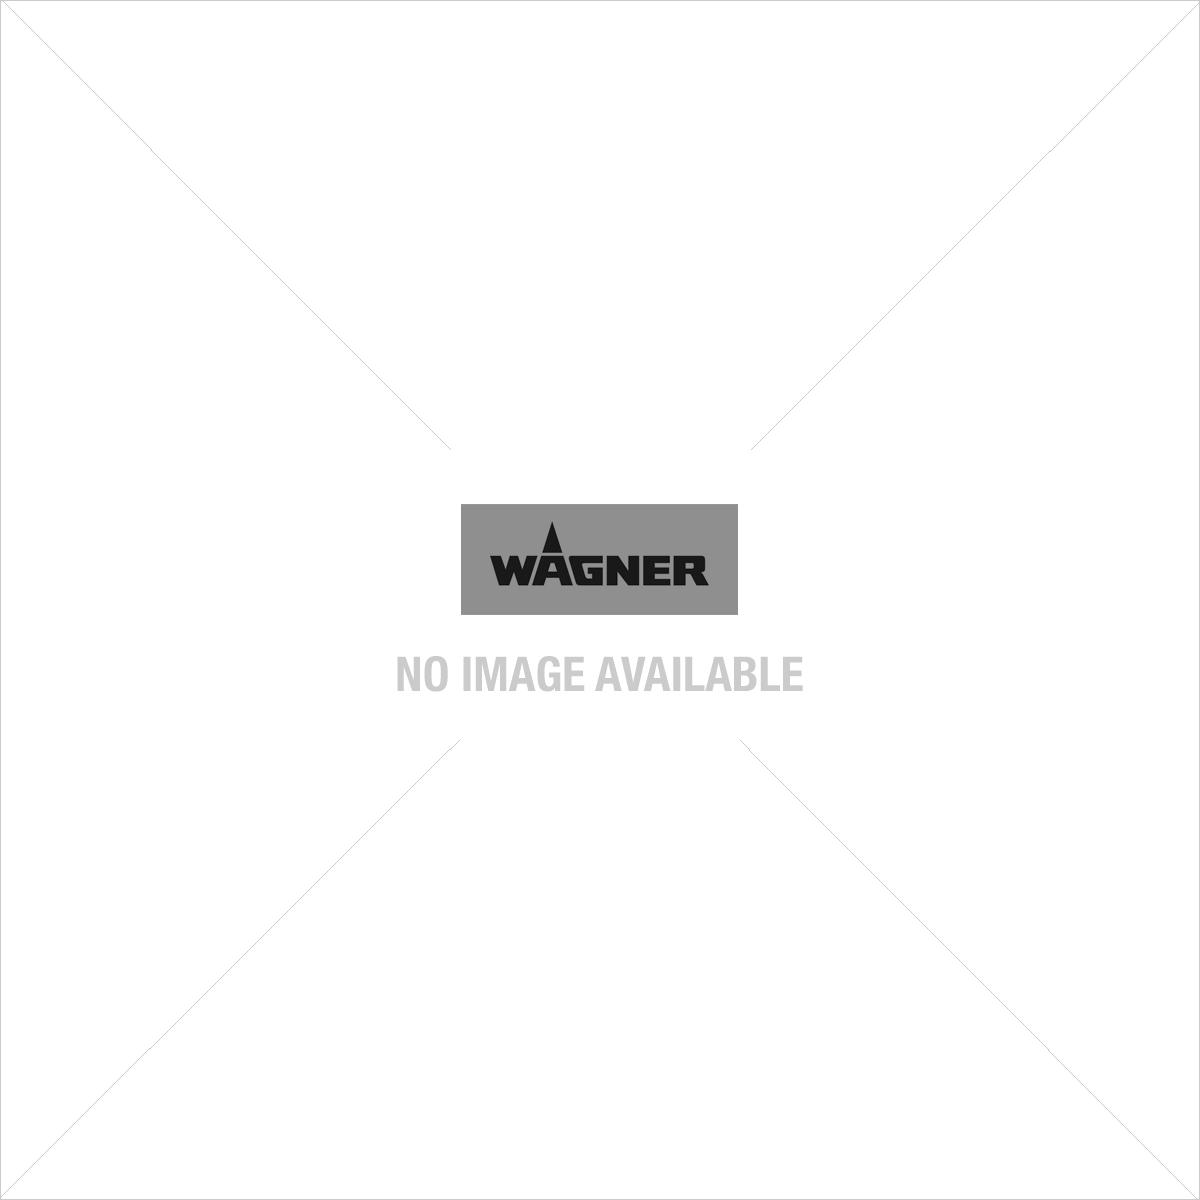 Wagner film de masquage avec ruban adhésif – Petit format